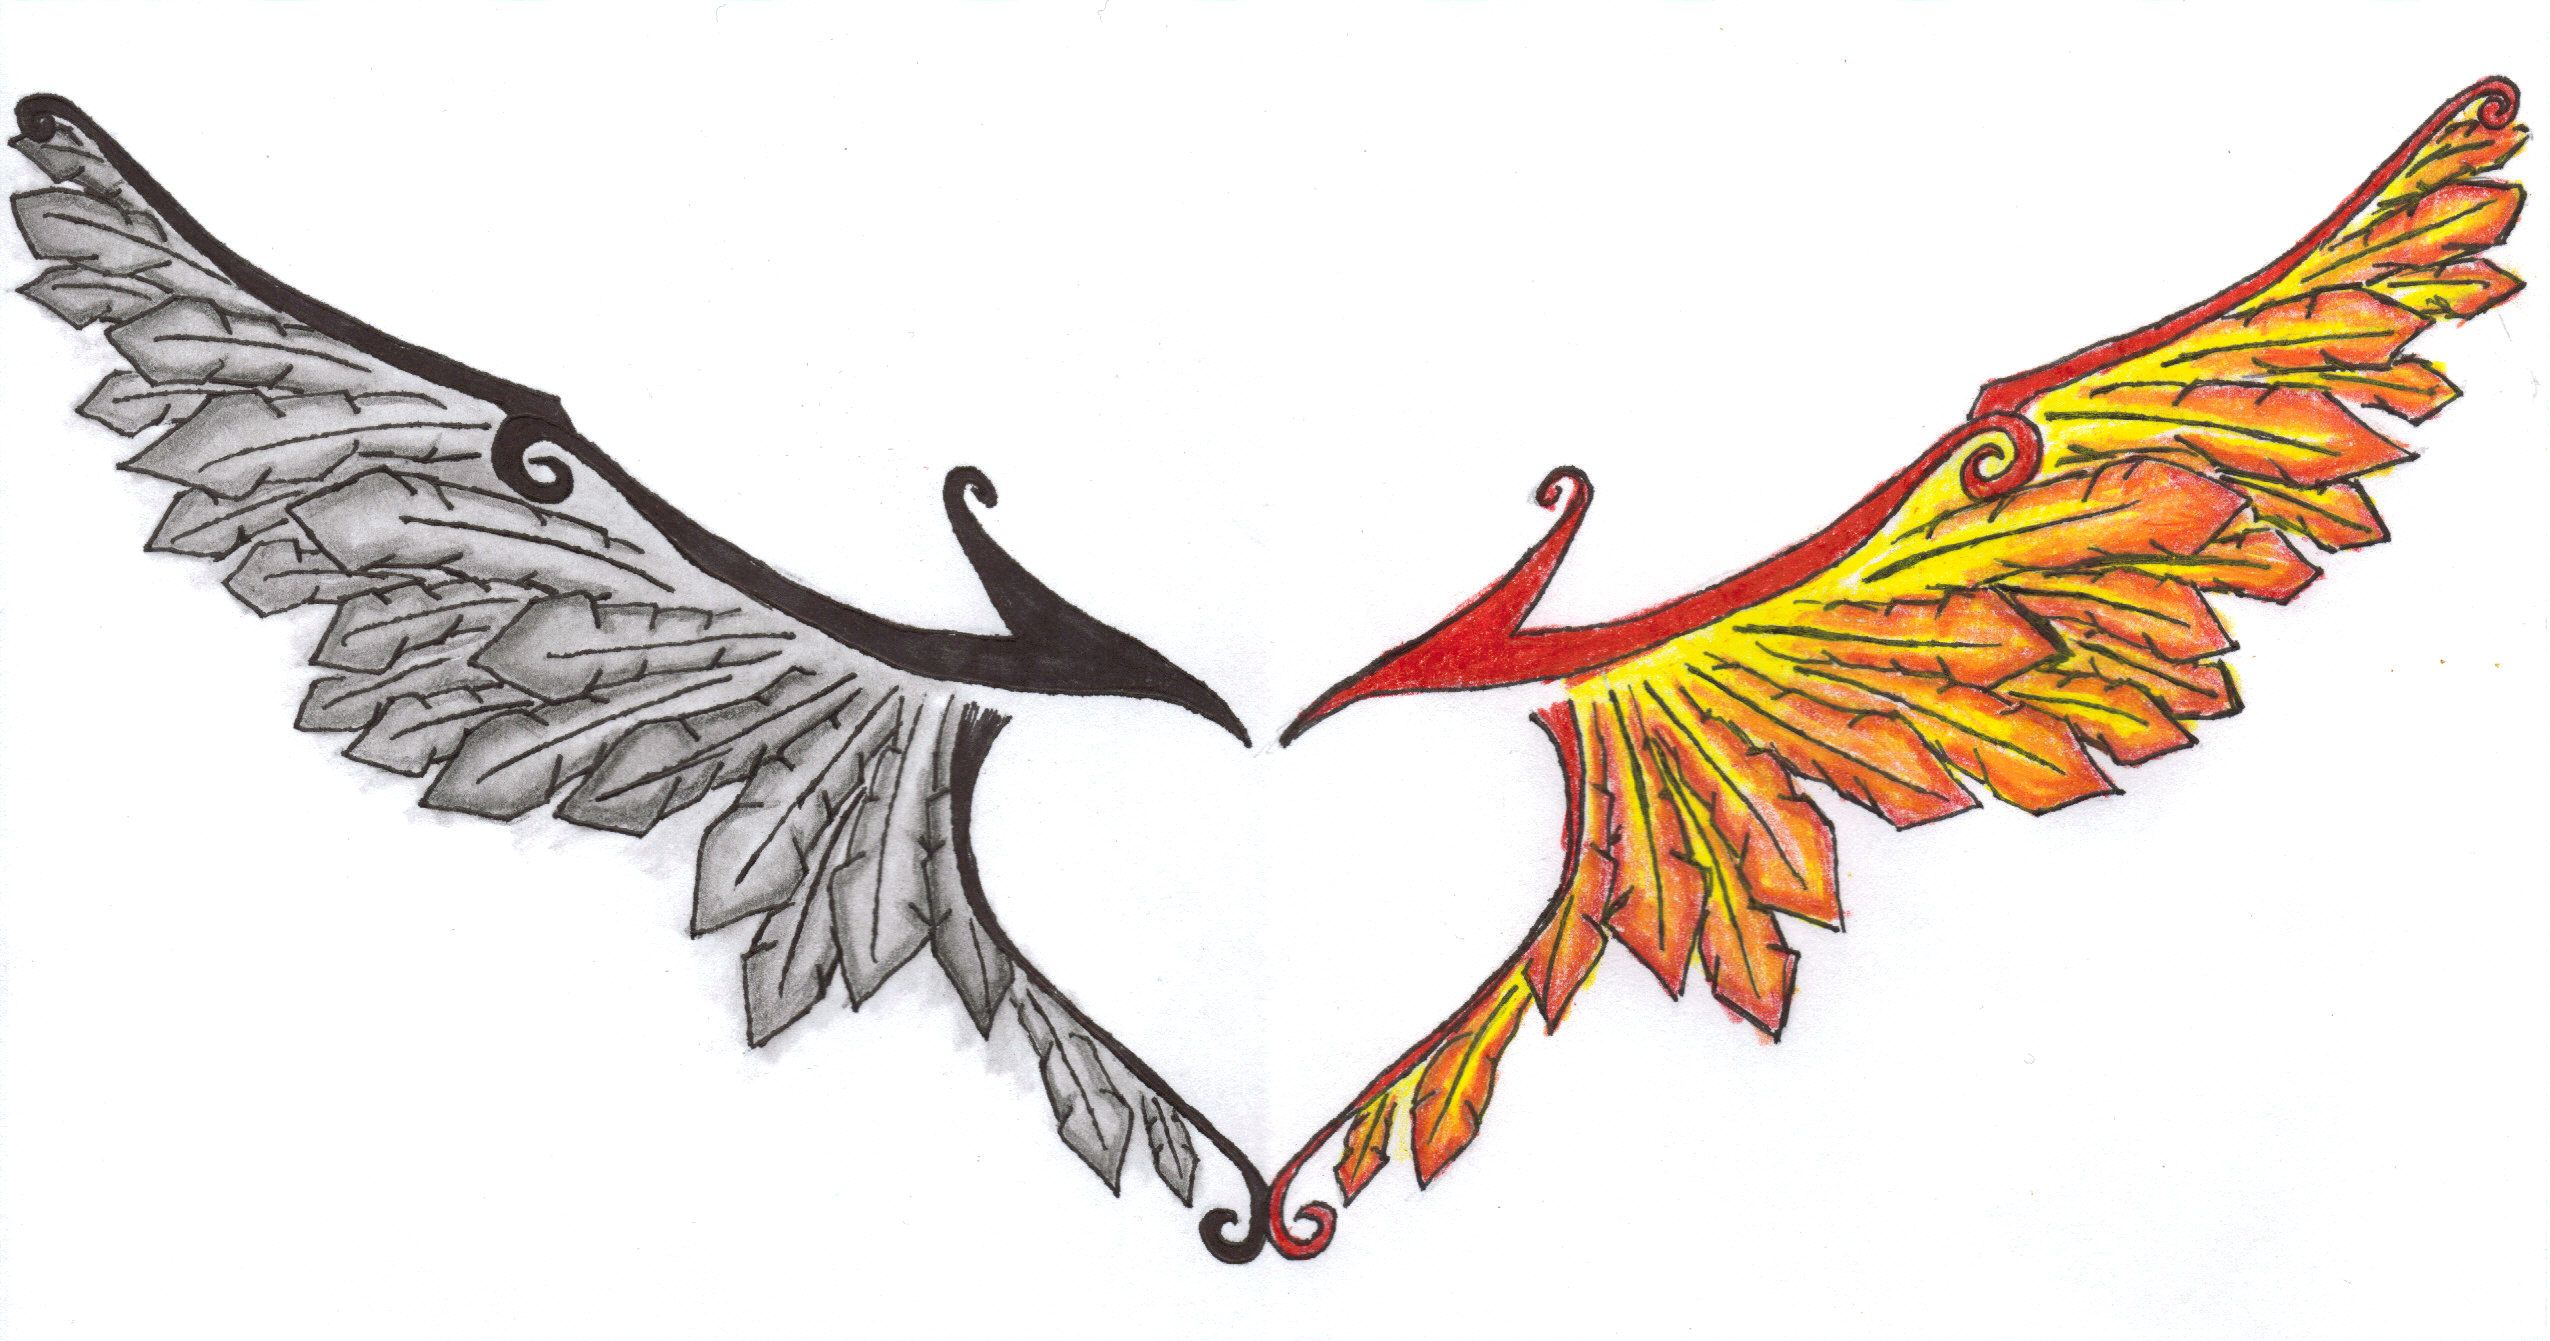 Phoenix wings clipart picture freeuse download Phoenix Wings by SaraStar on DeviantArt   Wings and Feathers ... picture freeuse download